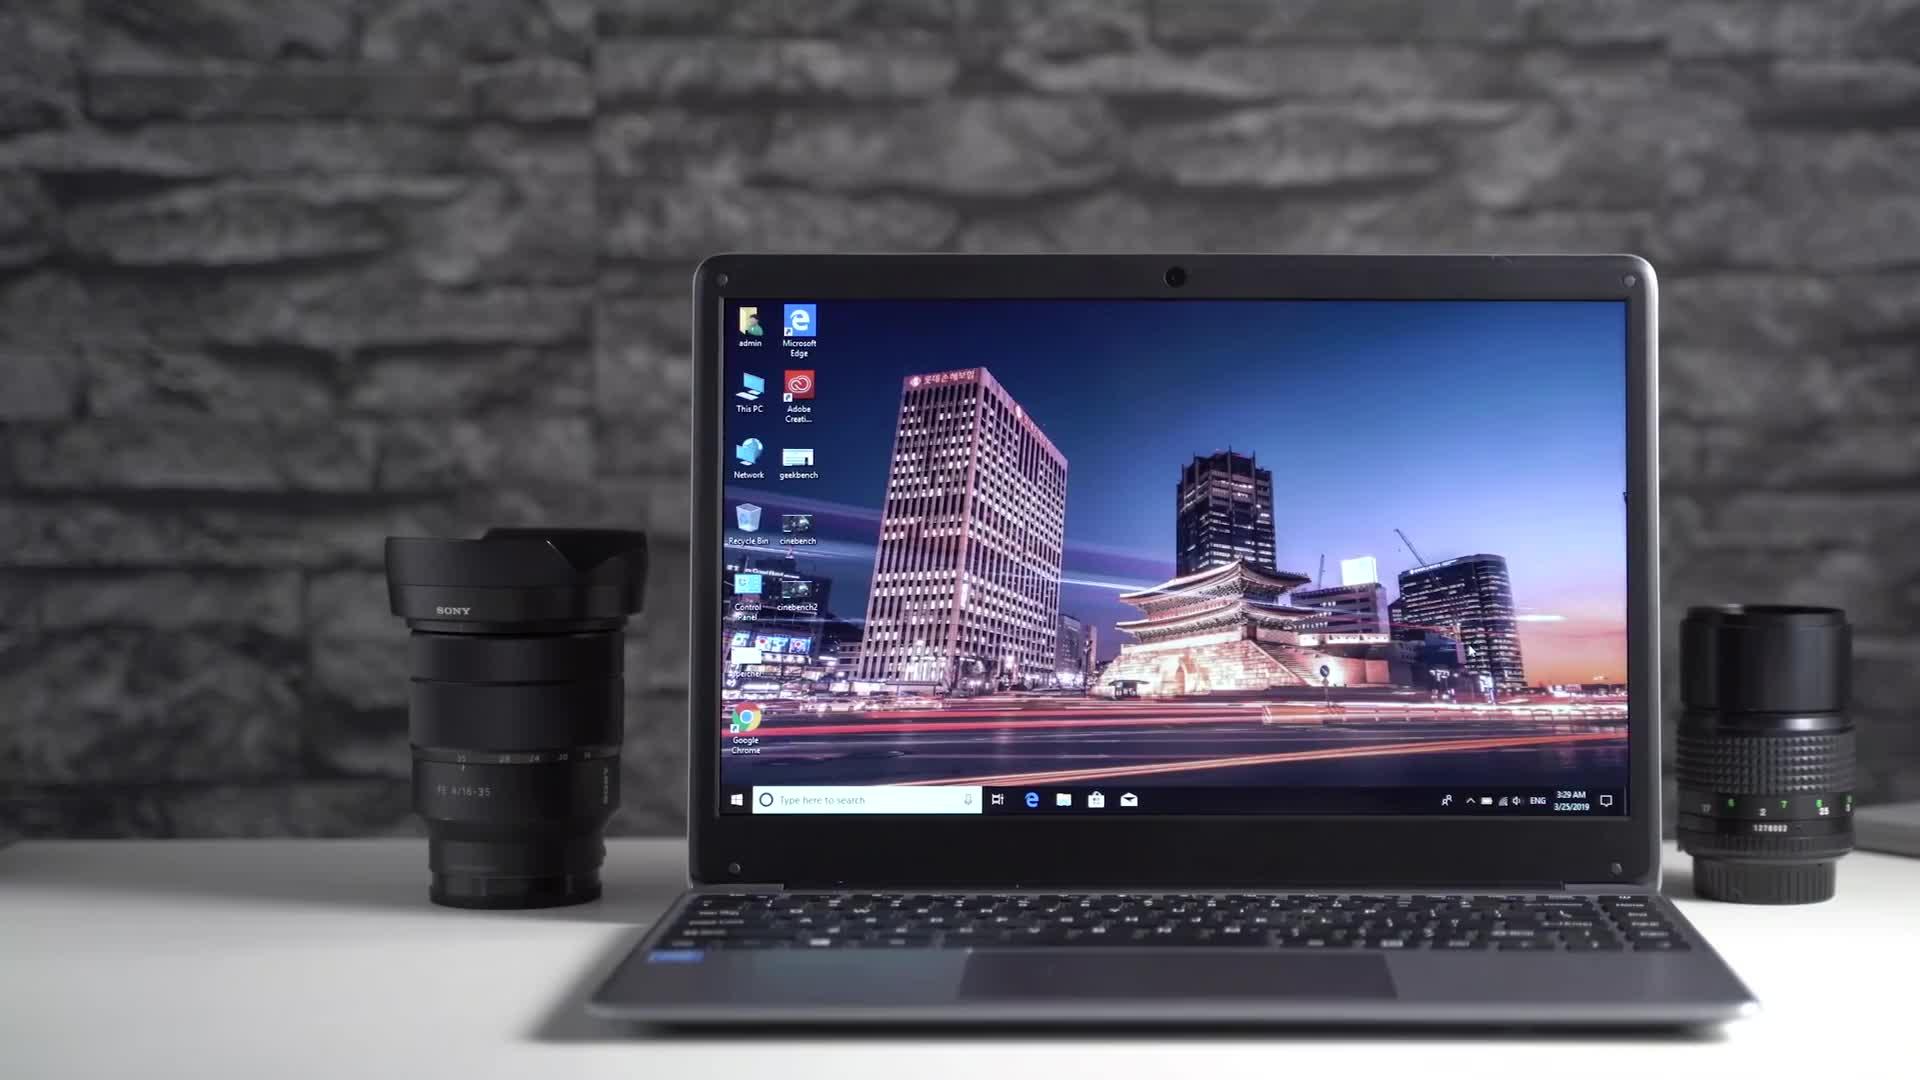 Windows 10, Notebook, Laptop, Test, Andrzej Tokarski, Tabletblog, Chuwi, Chuwi HeroBook, HeroBook